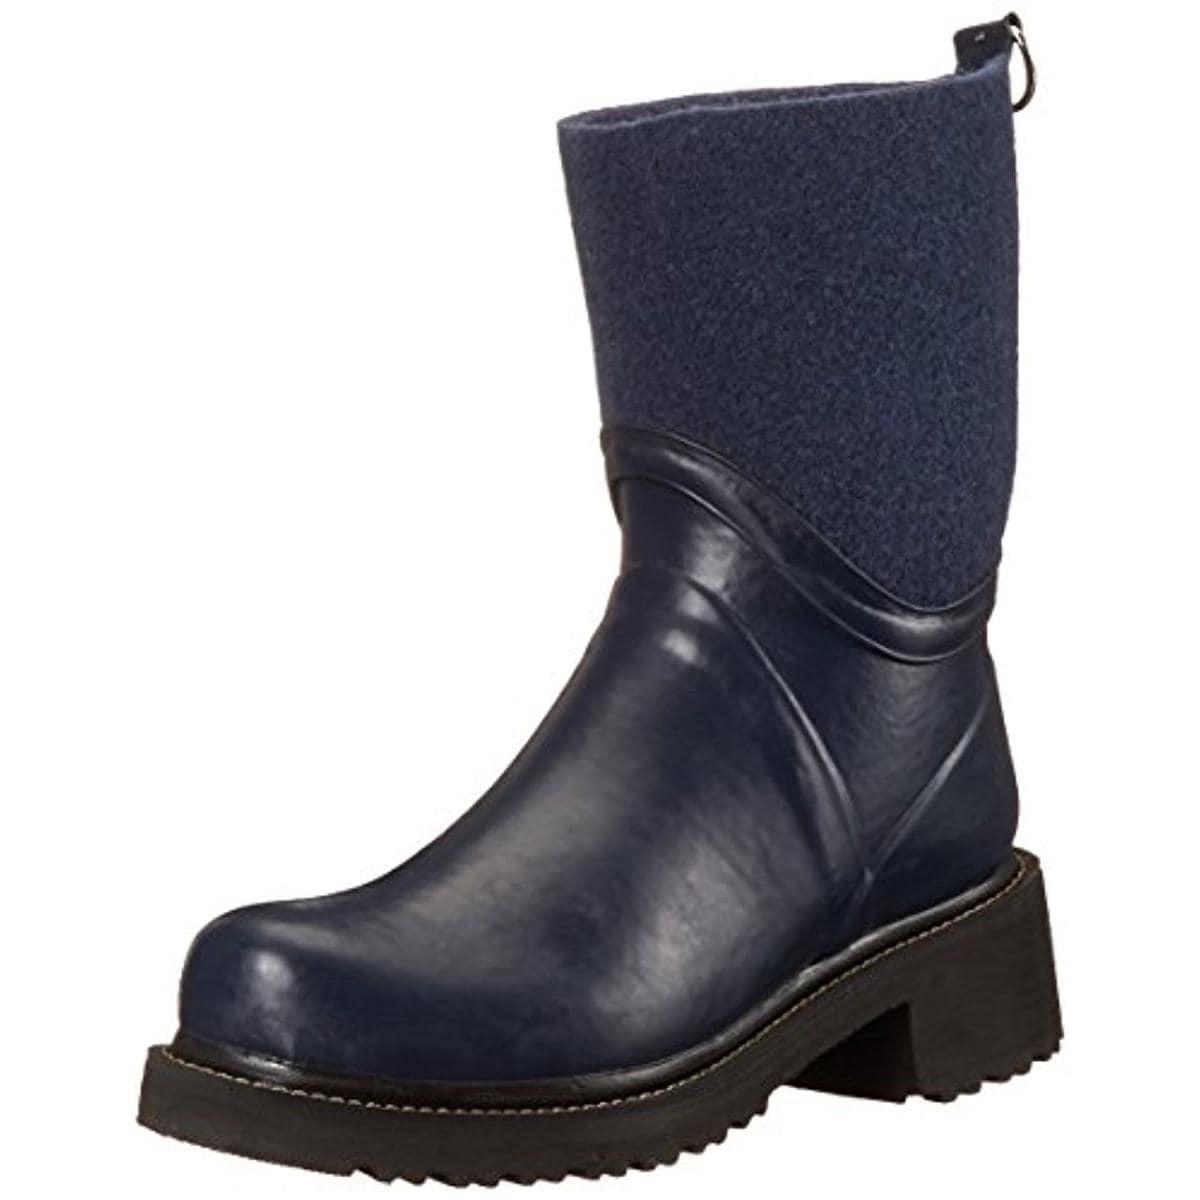 Ilse Jacobsen Womens Rub 53 Rain Boots Rubber Felt - Thumbnail 0